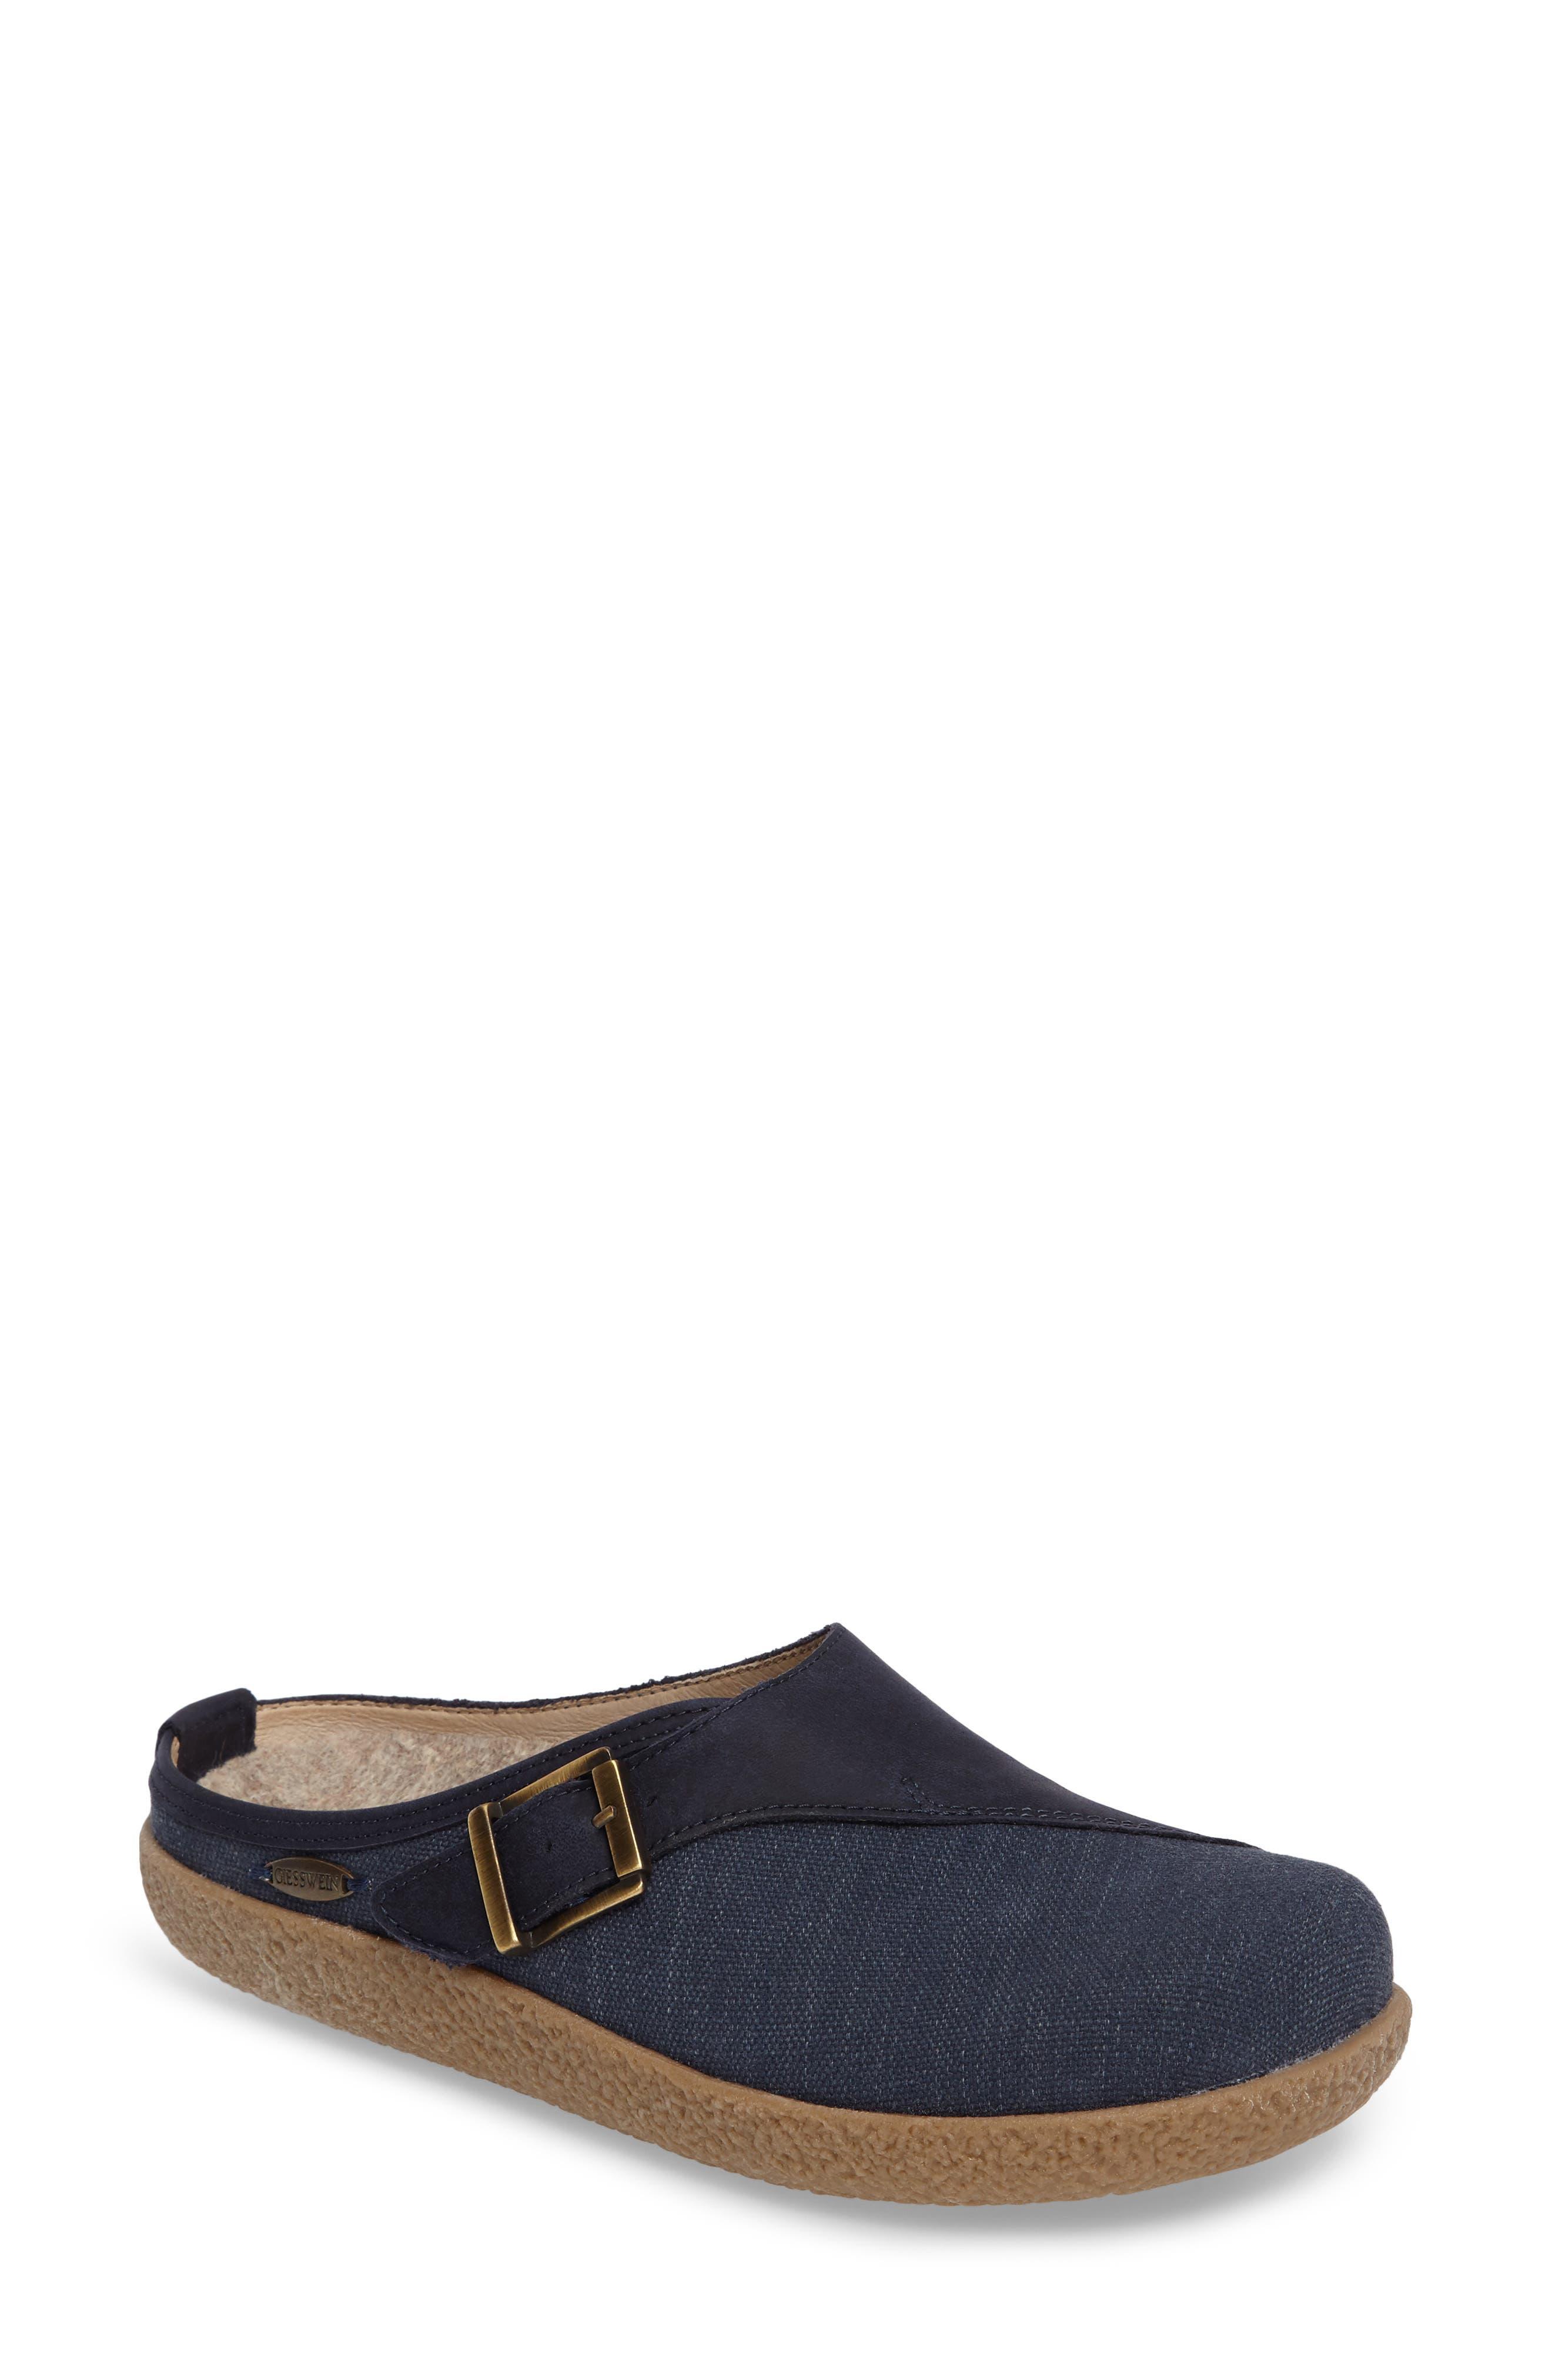 Radler Slipper Mule,                         Main,                         color, Jeans Leather